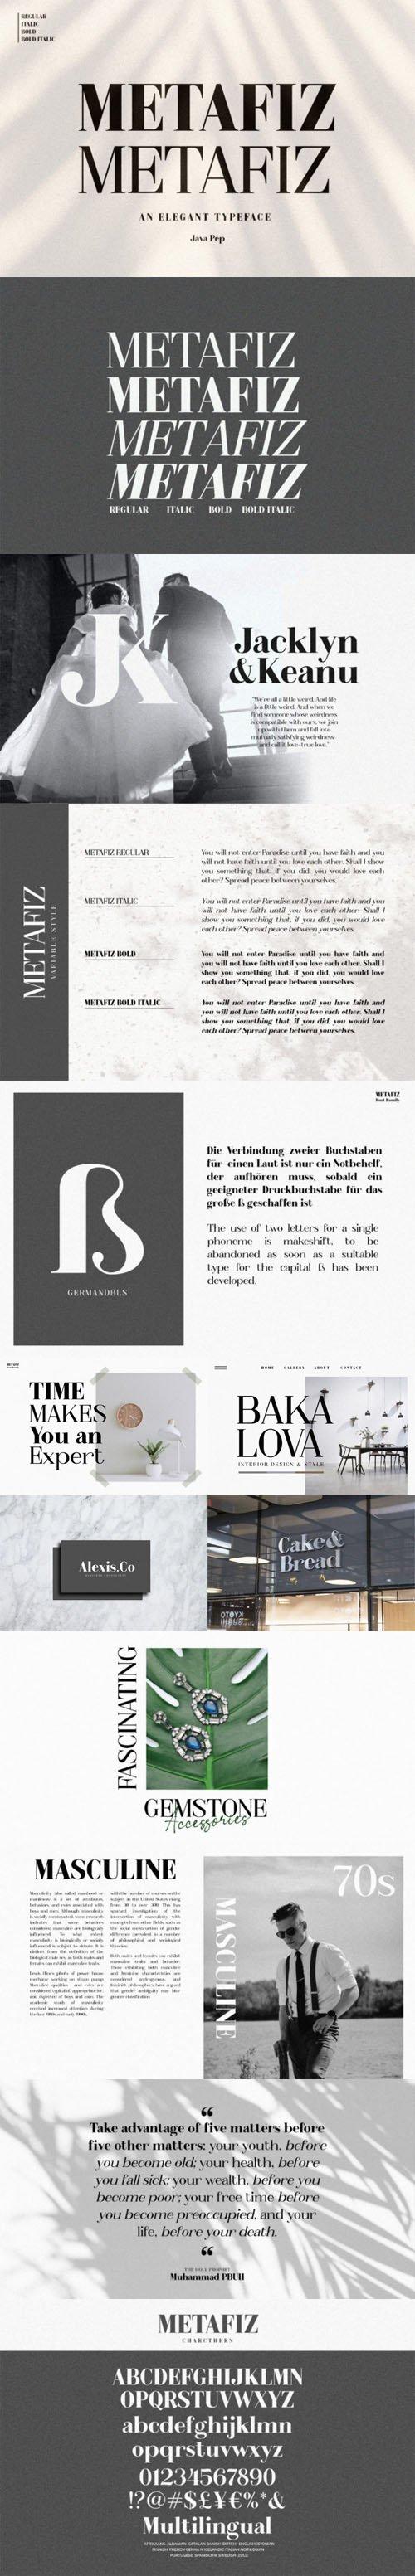 Metafiz - Elegant Bold Serif Typeface [4-Weights]